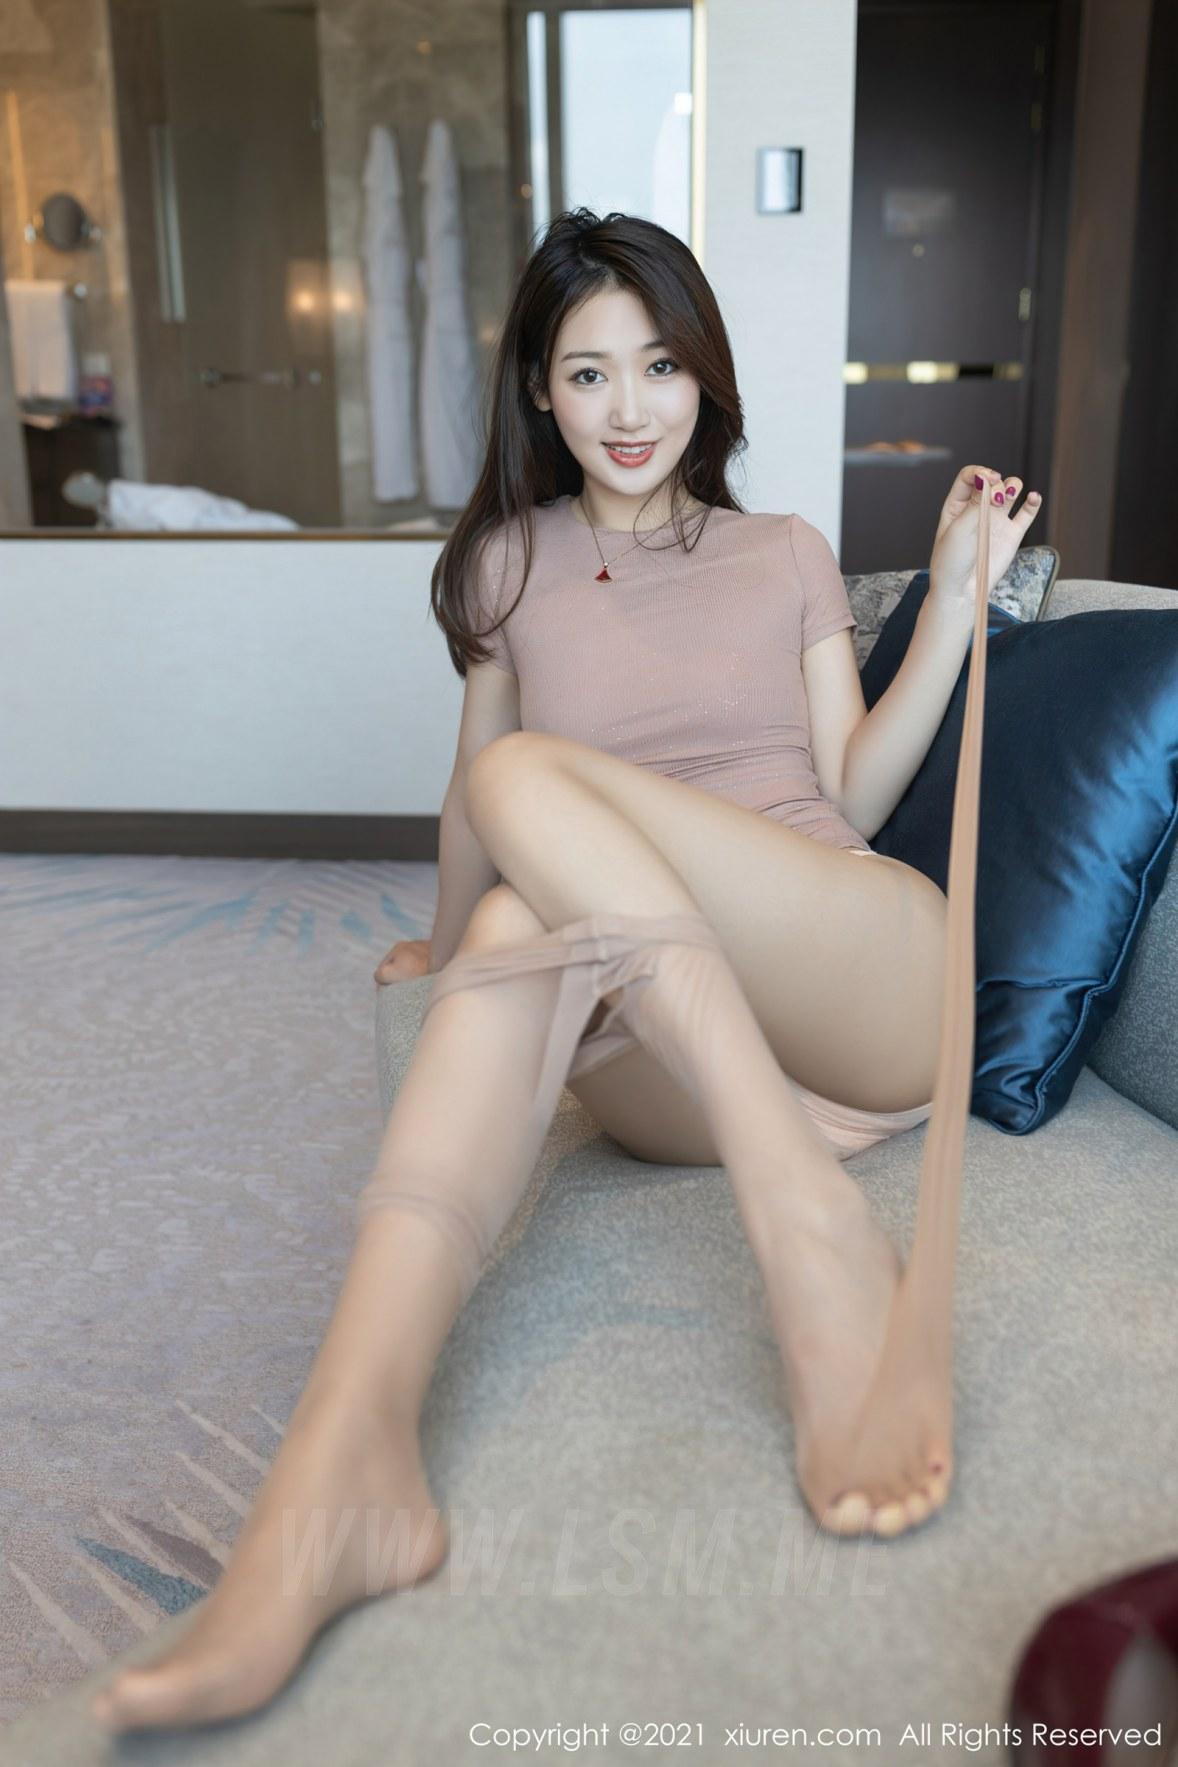 3780 047 1iz 3600 5400 - XiuRen 秀人 No.3780 裸色裙主题系列 唐安琪 澳门旅拍写真22 - 秀人网 -【免费在线写真】【丽人丝语】